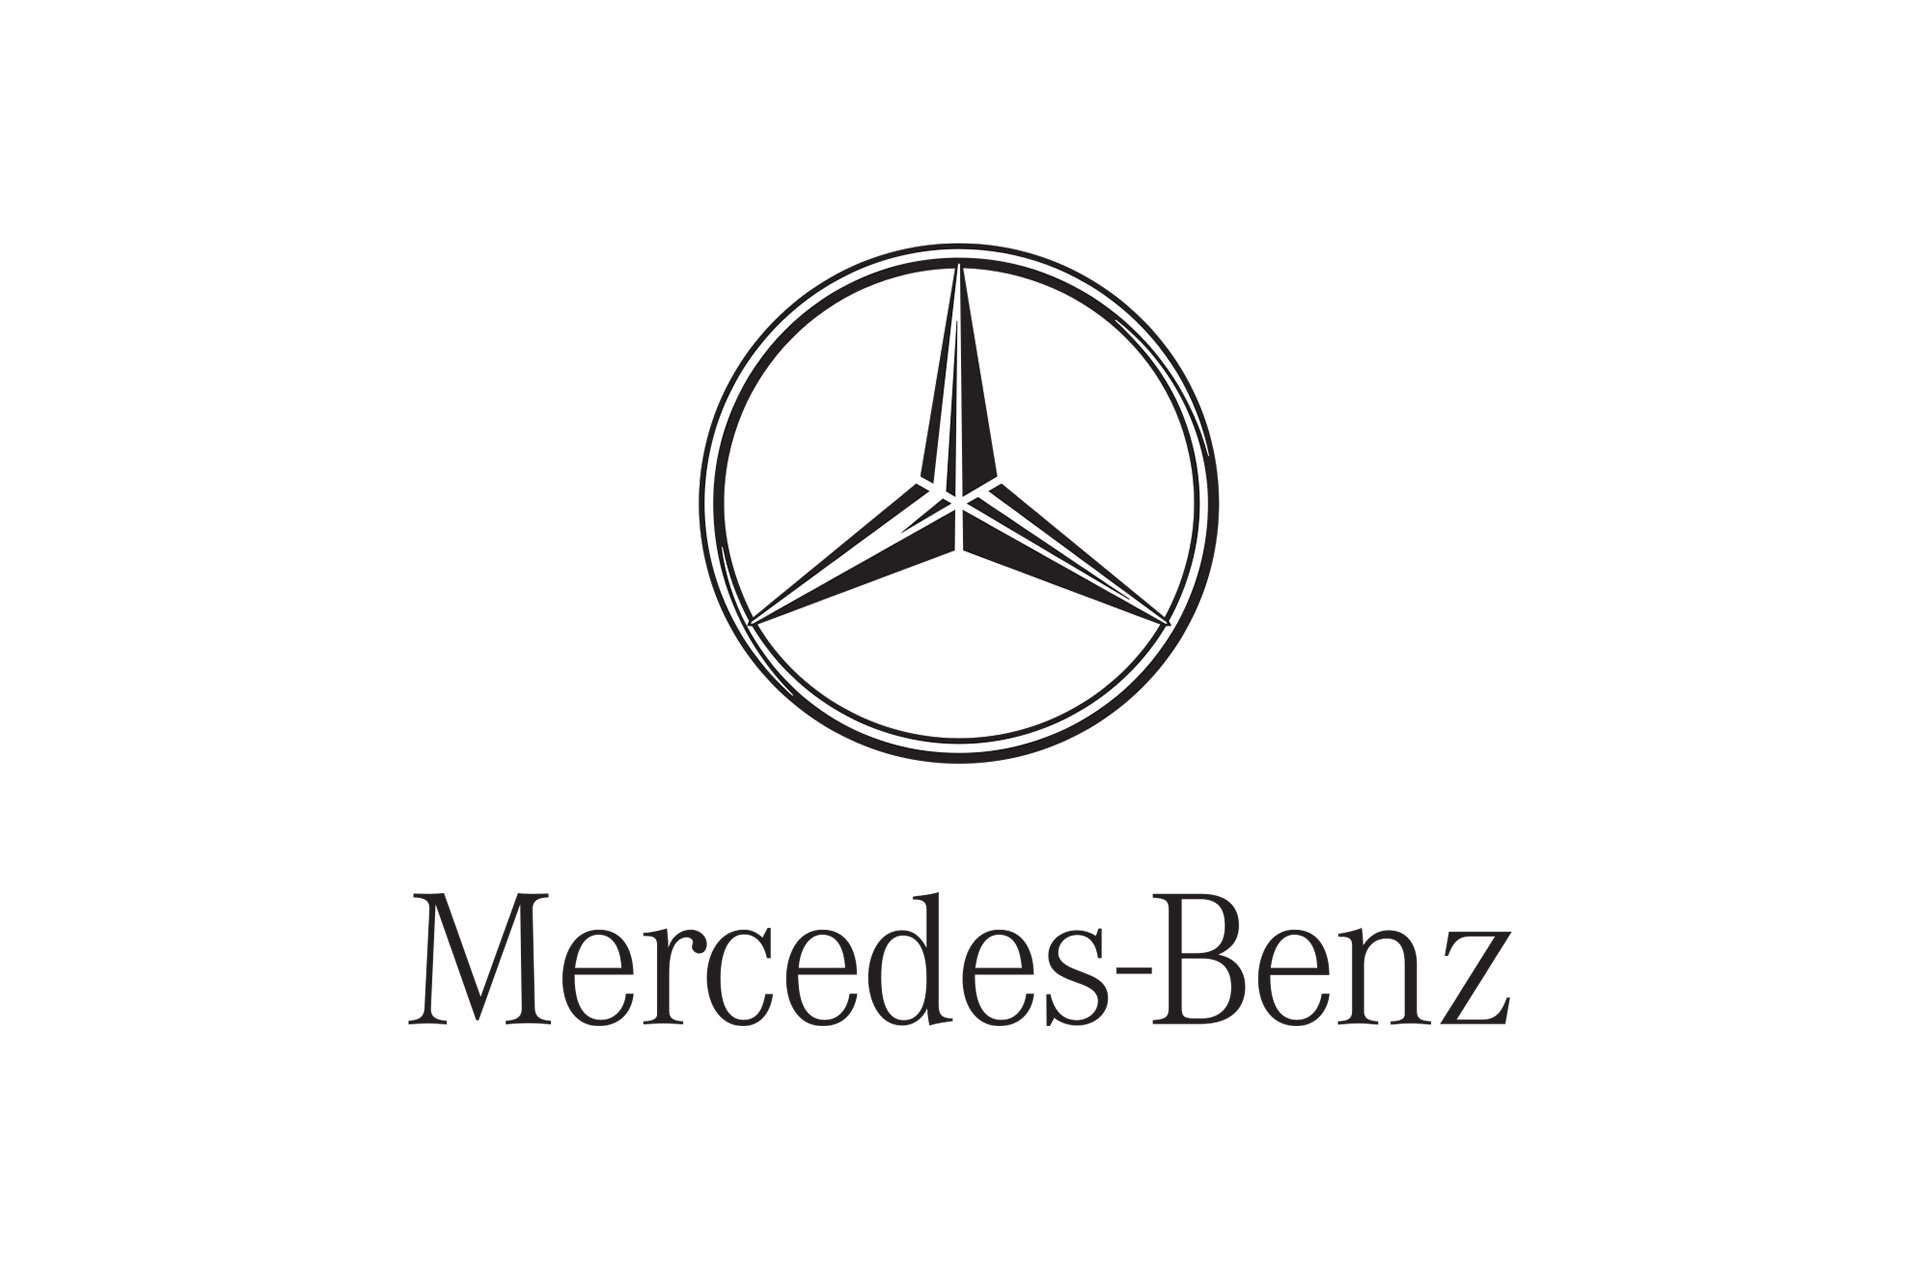 mercedes benz referenz jentner metallveredelung logo farbig